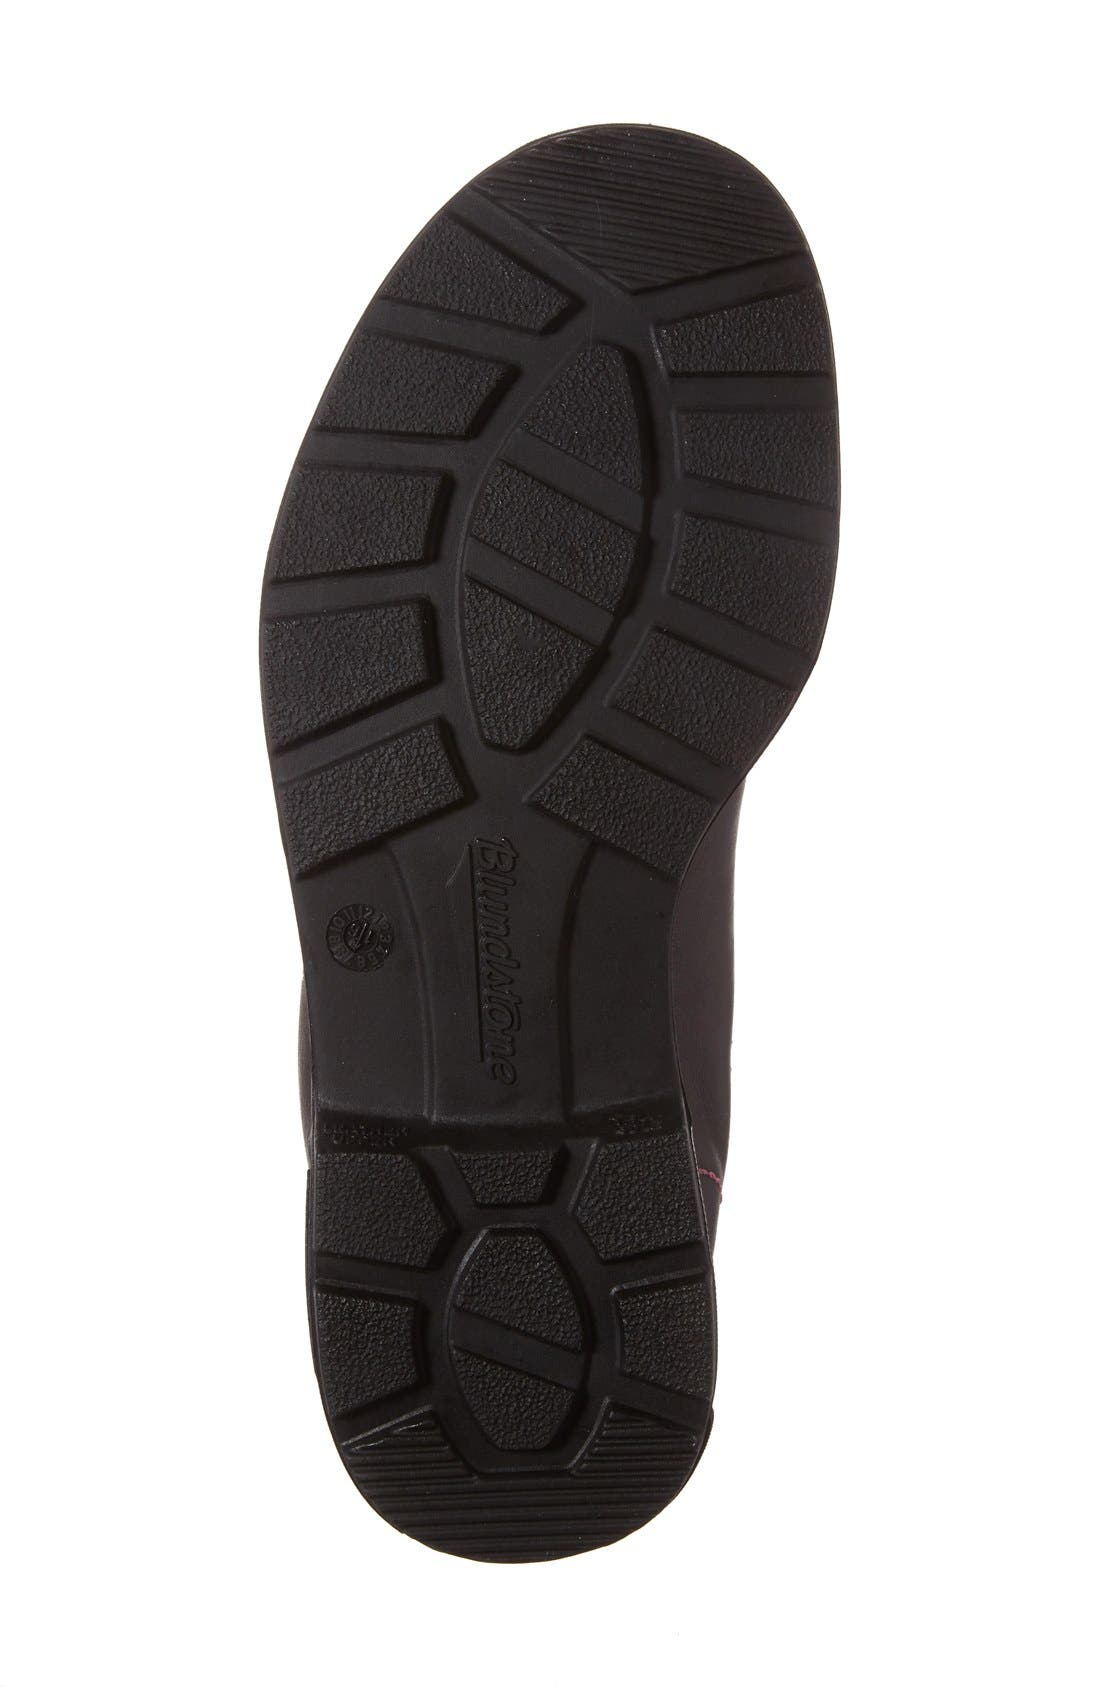 Footwear 'Original - 500 Series' Water Resistant Chelsea Boot,                             Alternate thumbnail 4, color,                             200